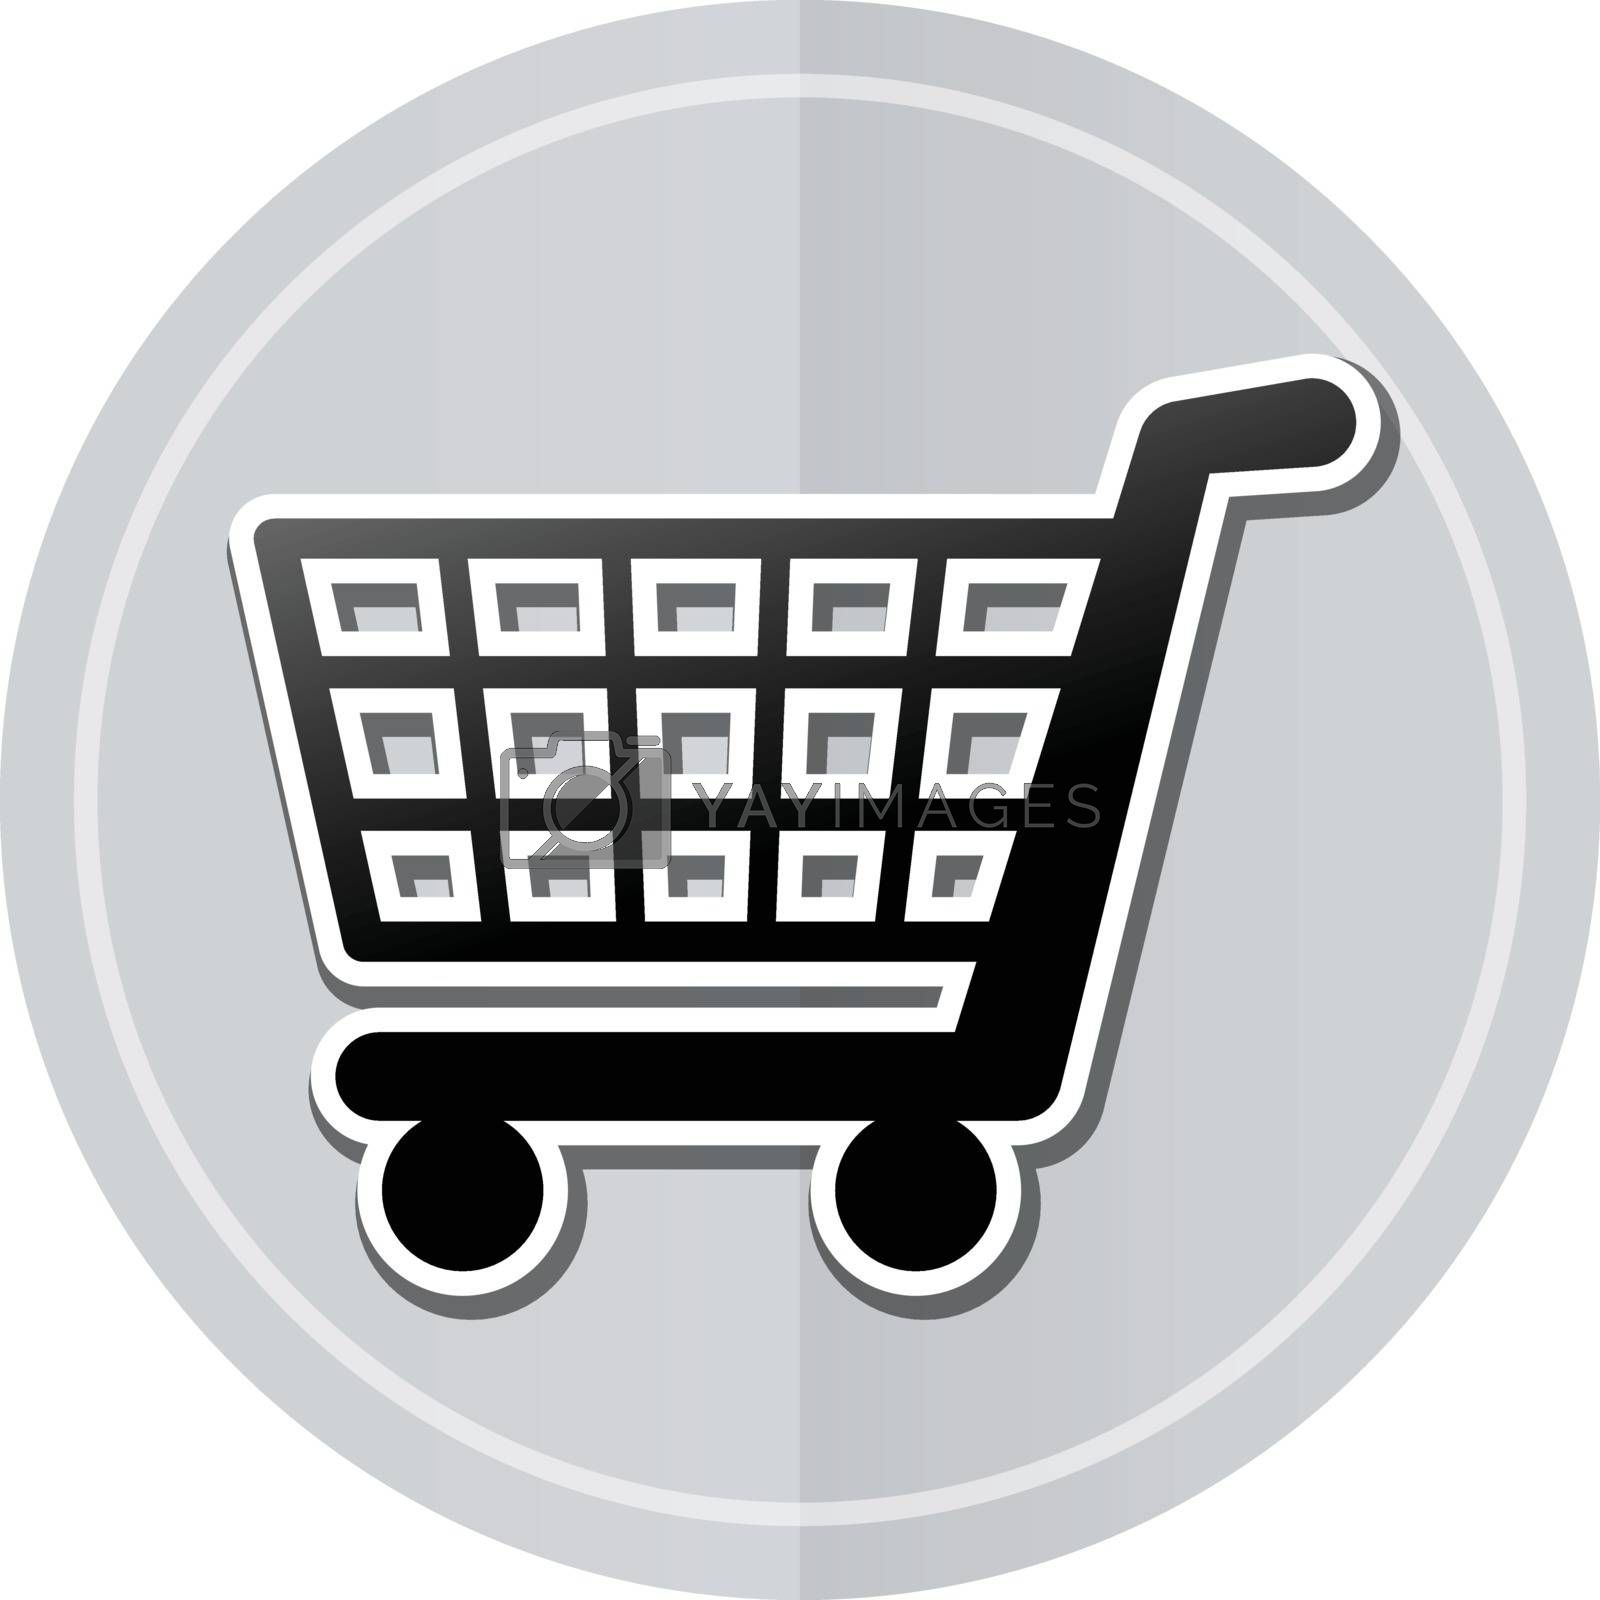 Illustration of shopping sticker icon simple design